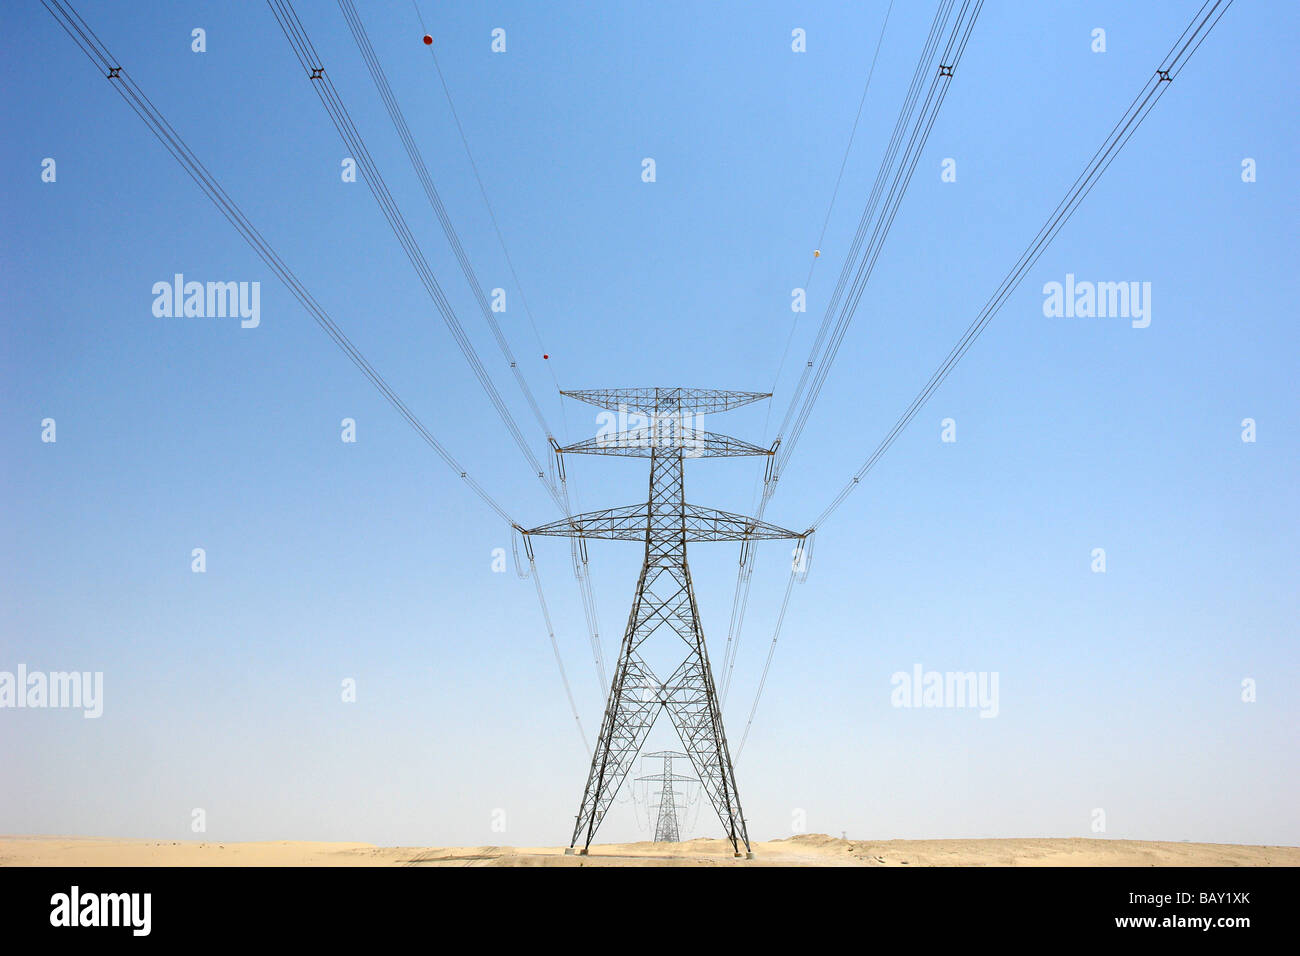 High Voltage Power Supply Lines Energy Dubai United Arab Emirates Uae